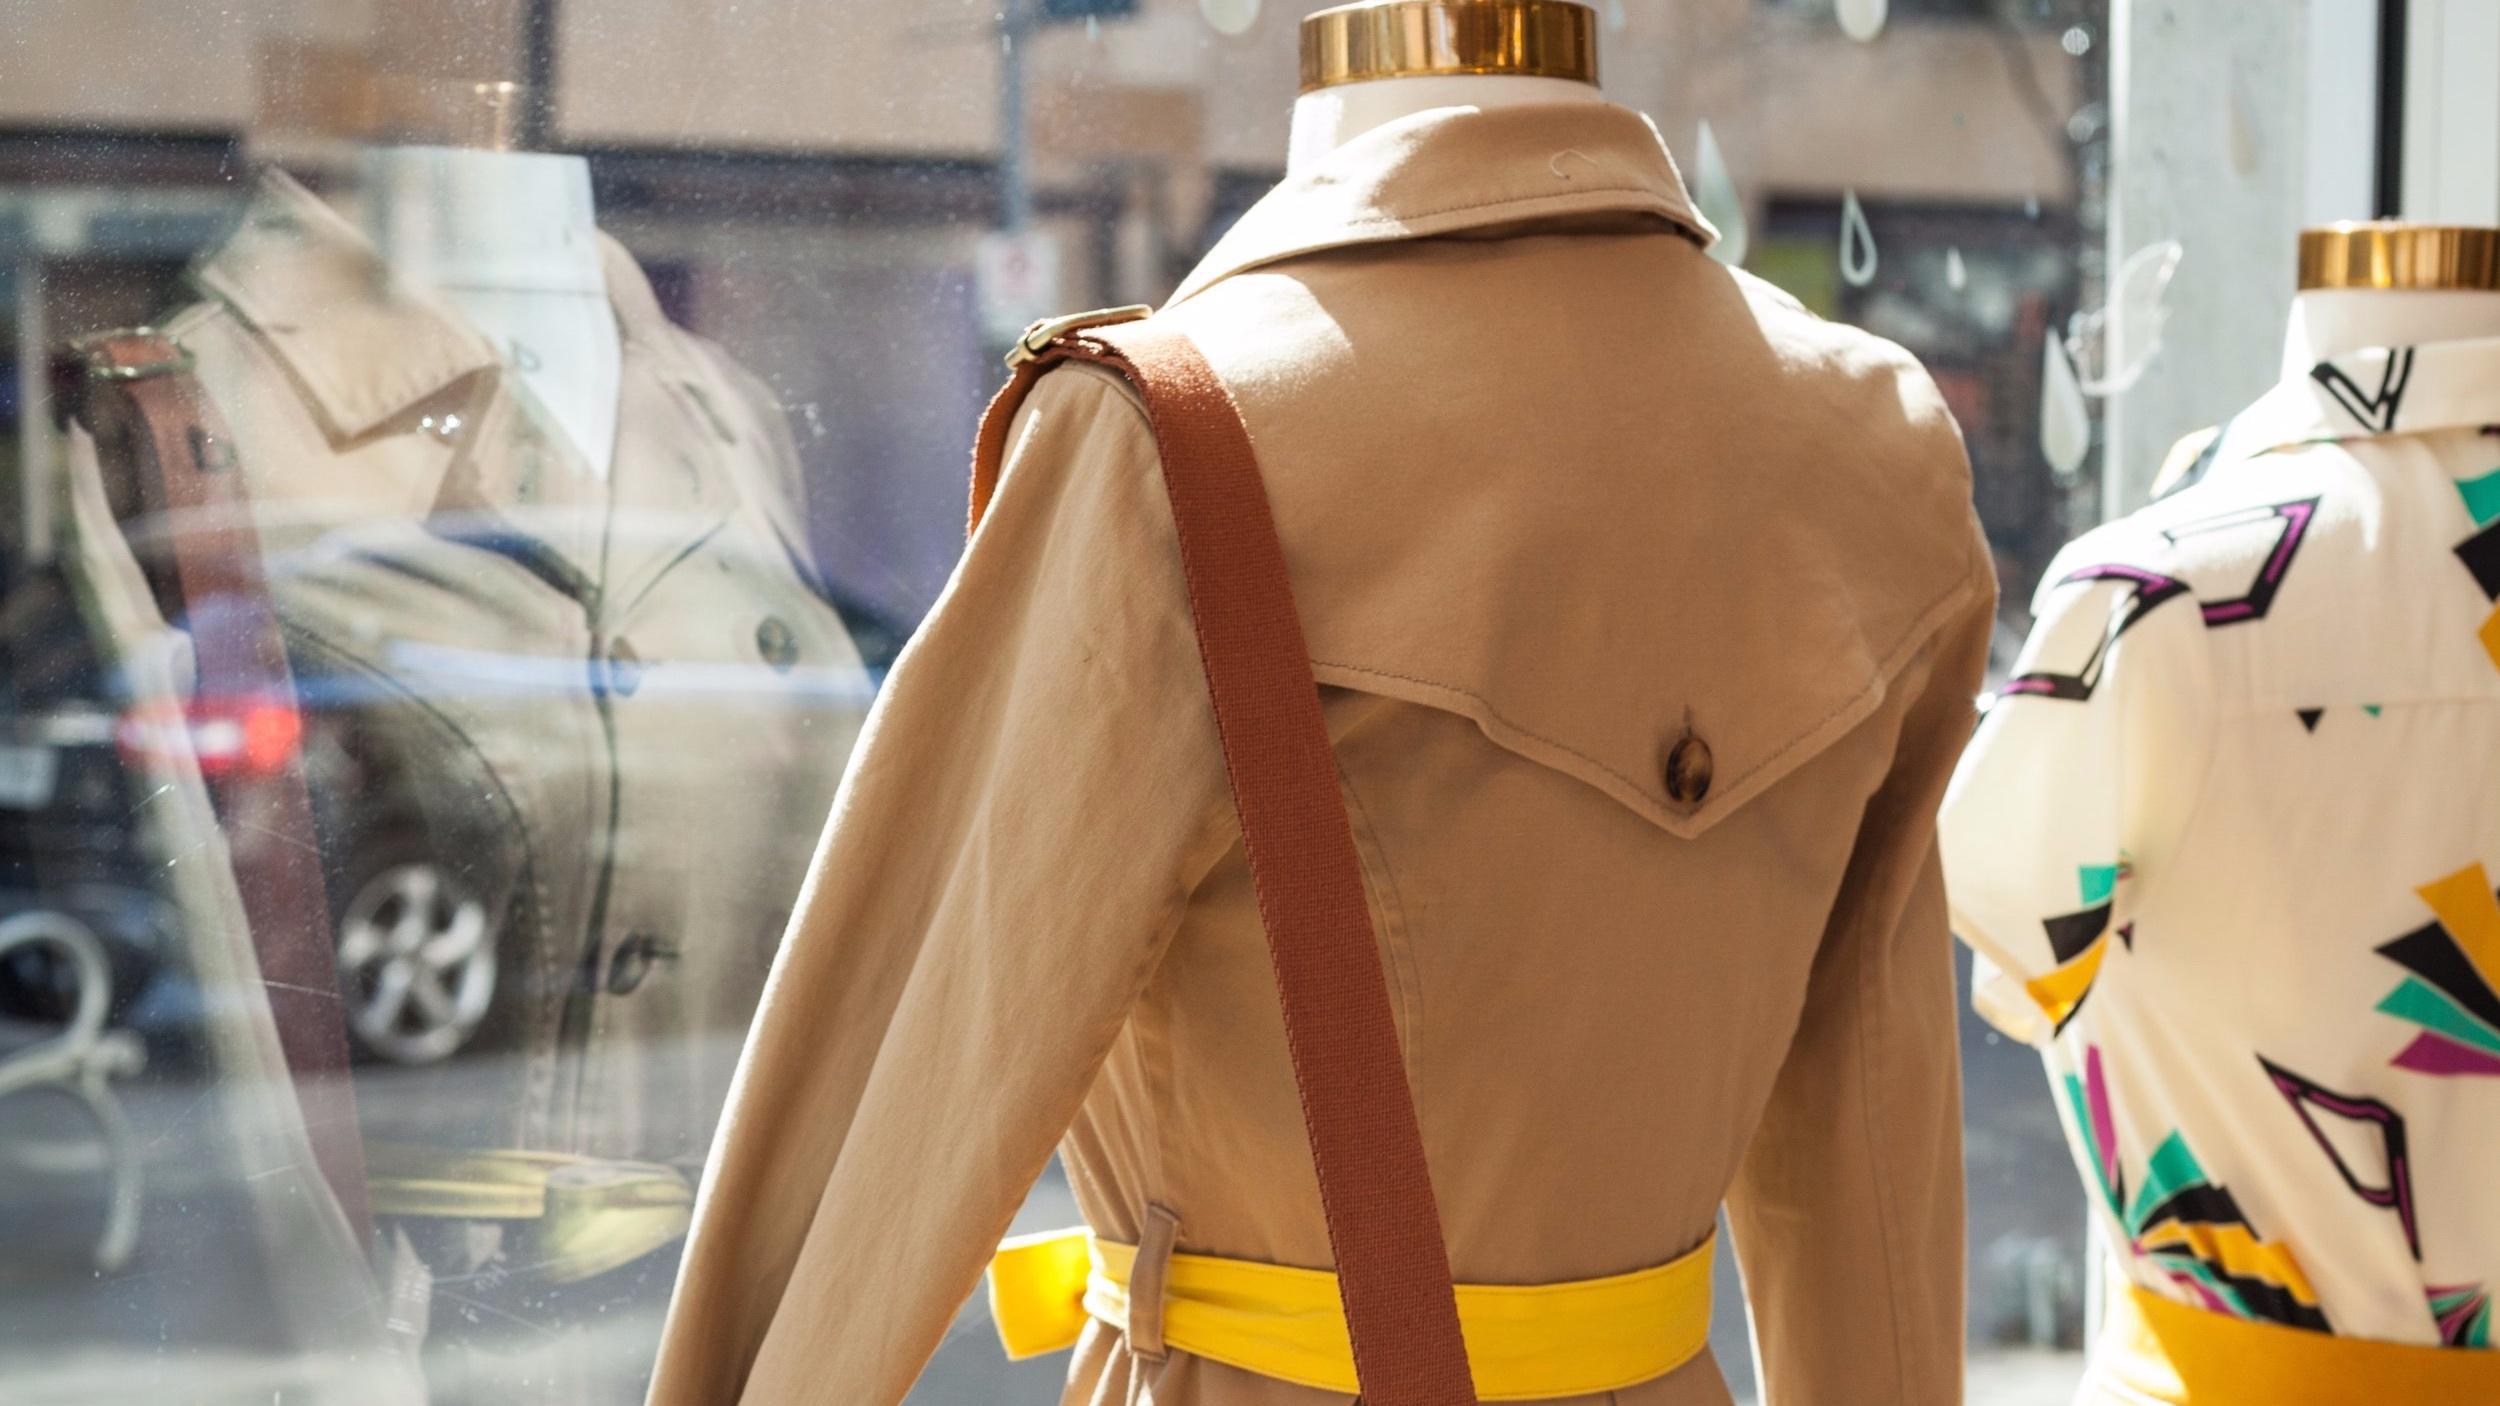 boutique-fashion-leather-bag-2002717.jpg